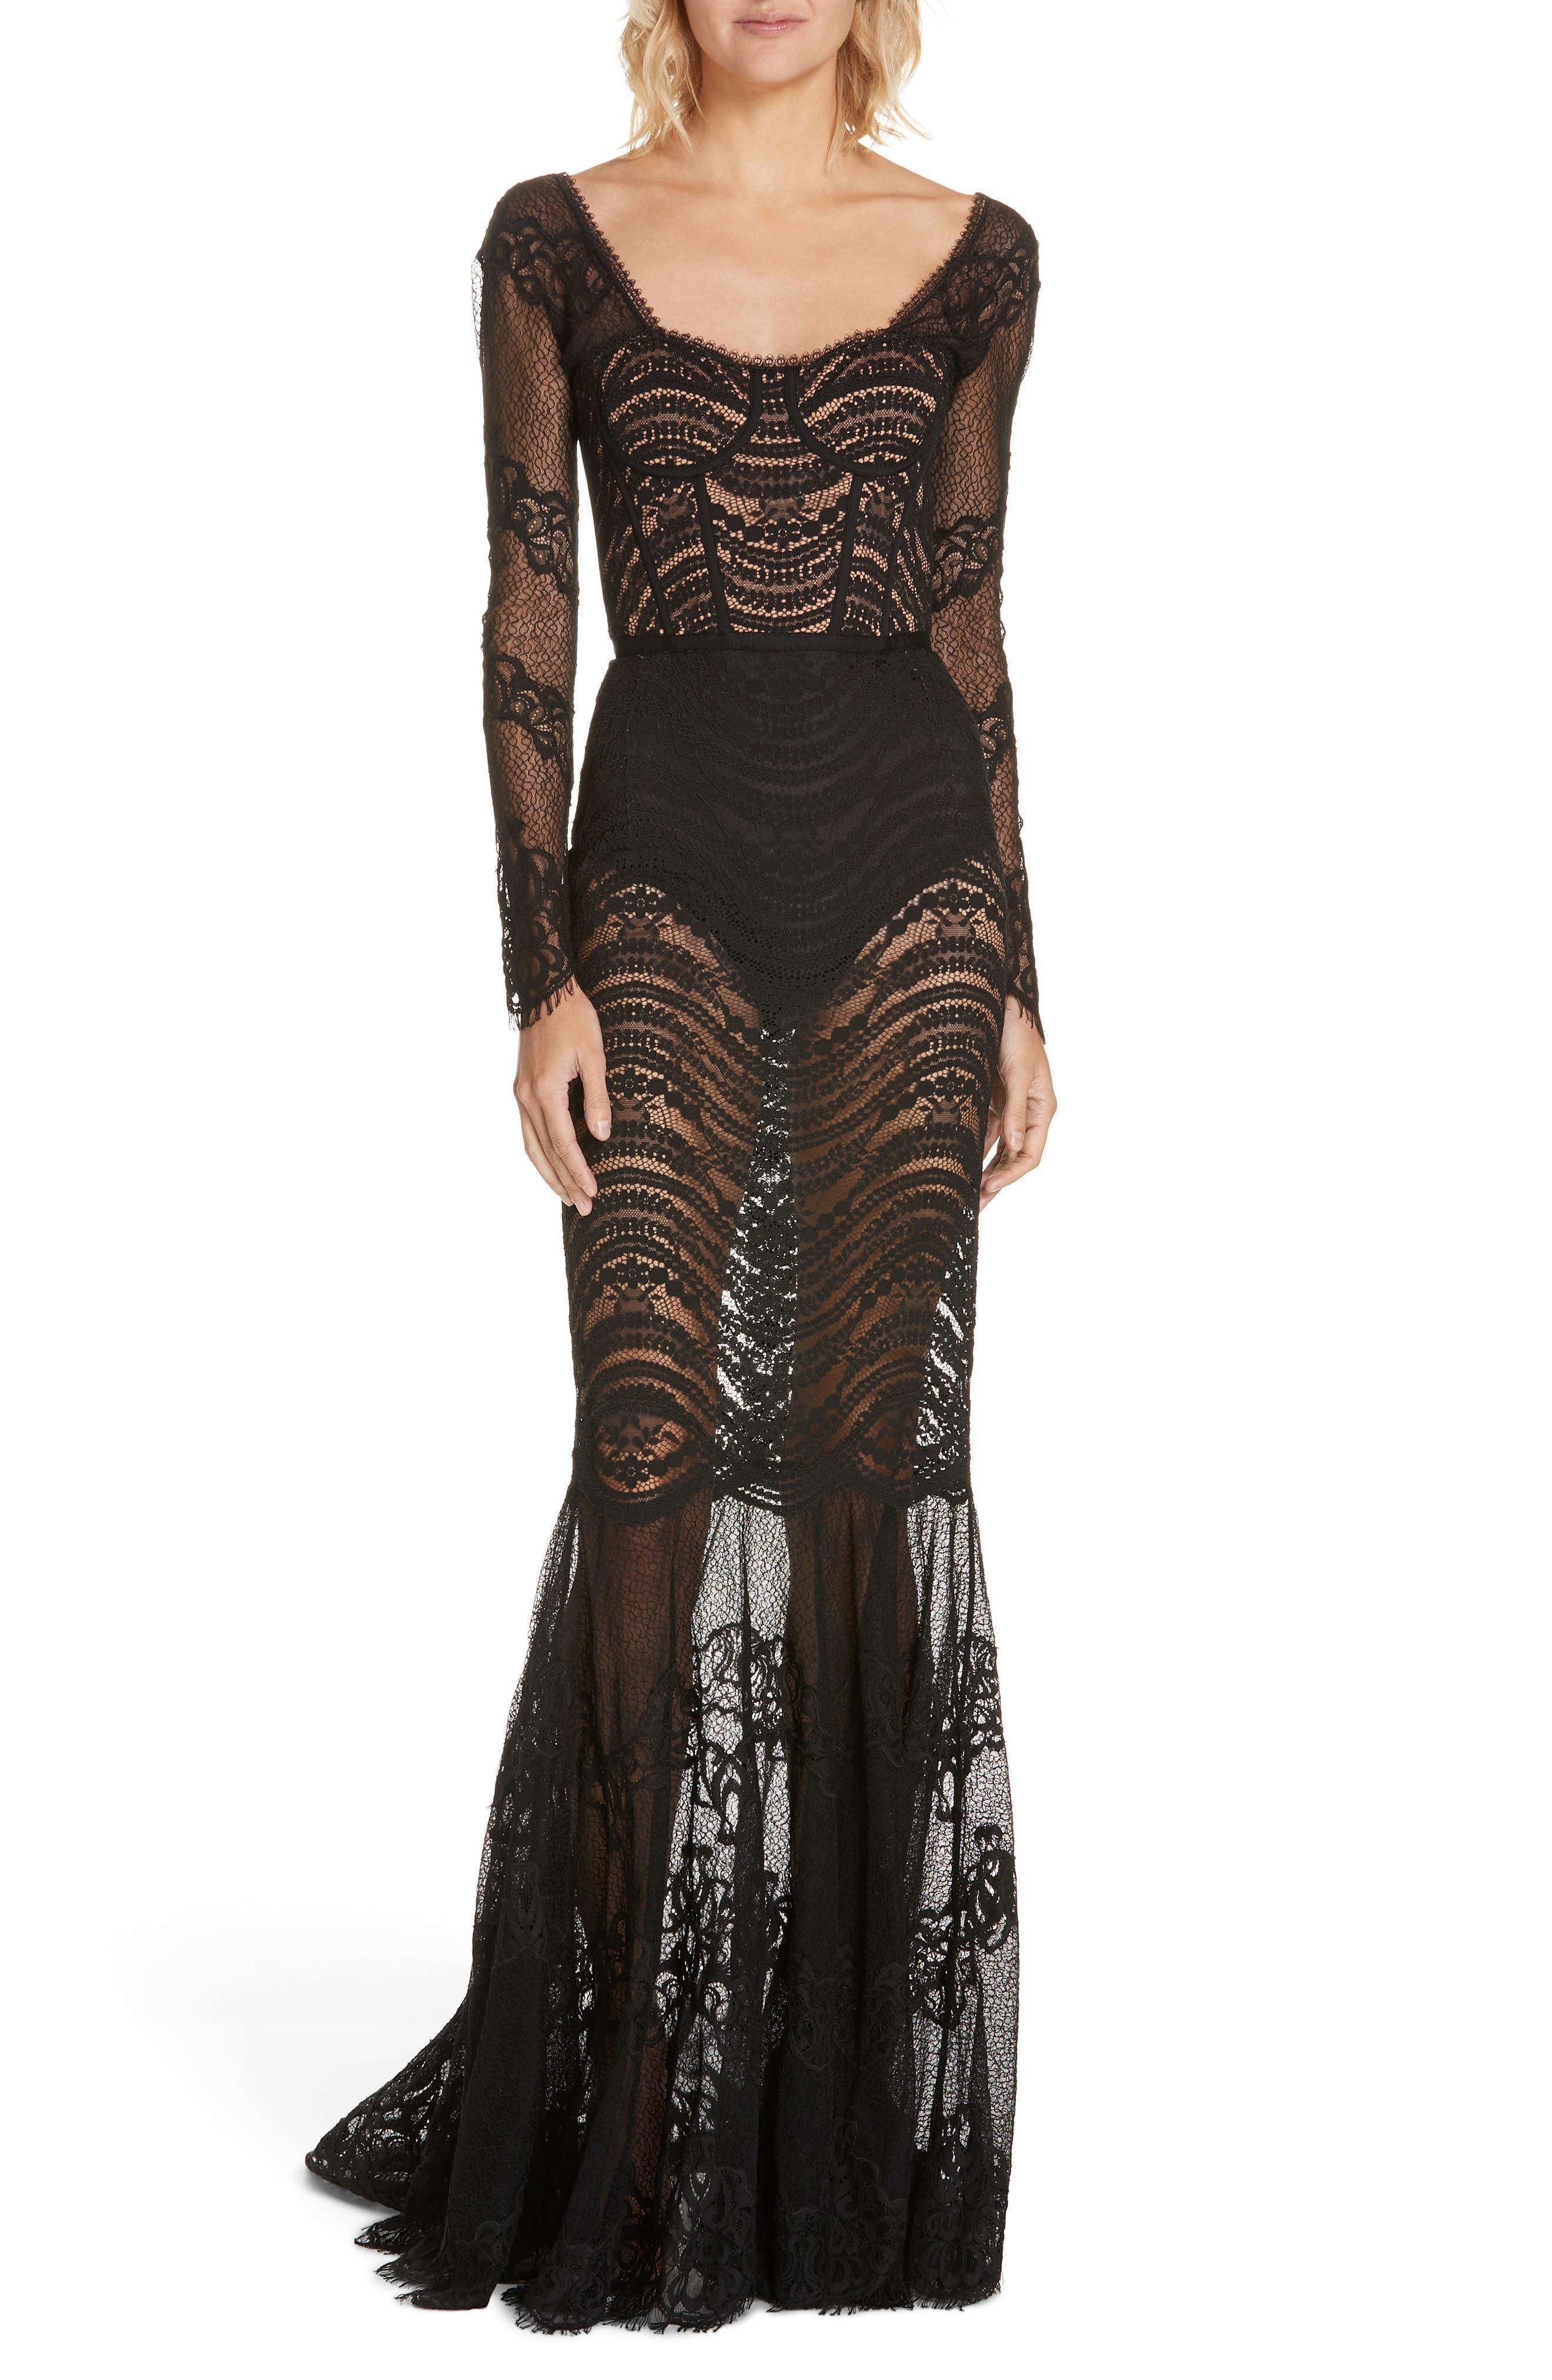 JONATHAN SIMKHAI,                             Lace Bustier Bodysuit Dress,                             Alternate thumbnail 5, color,                             BLACK